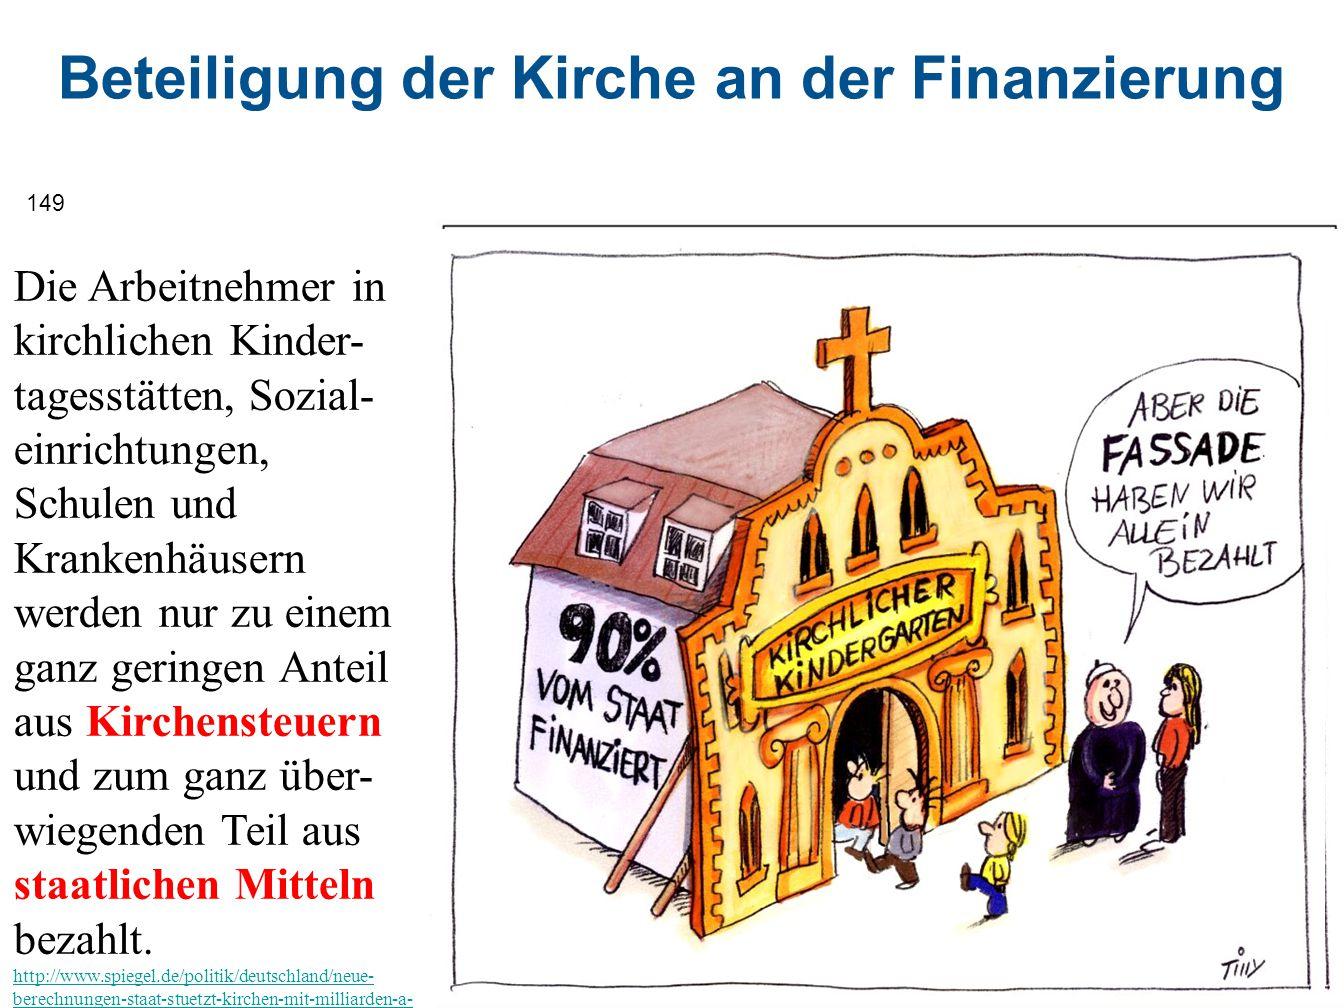 Beteiligung der Kirche an der Finanzierung